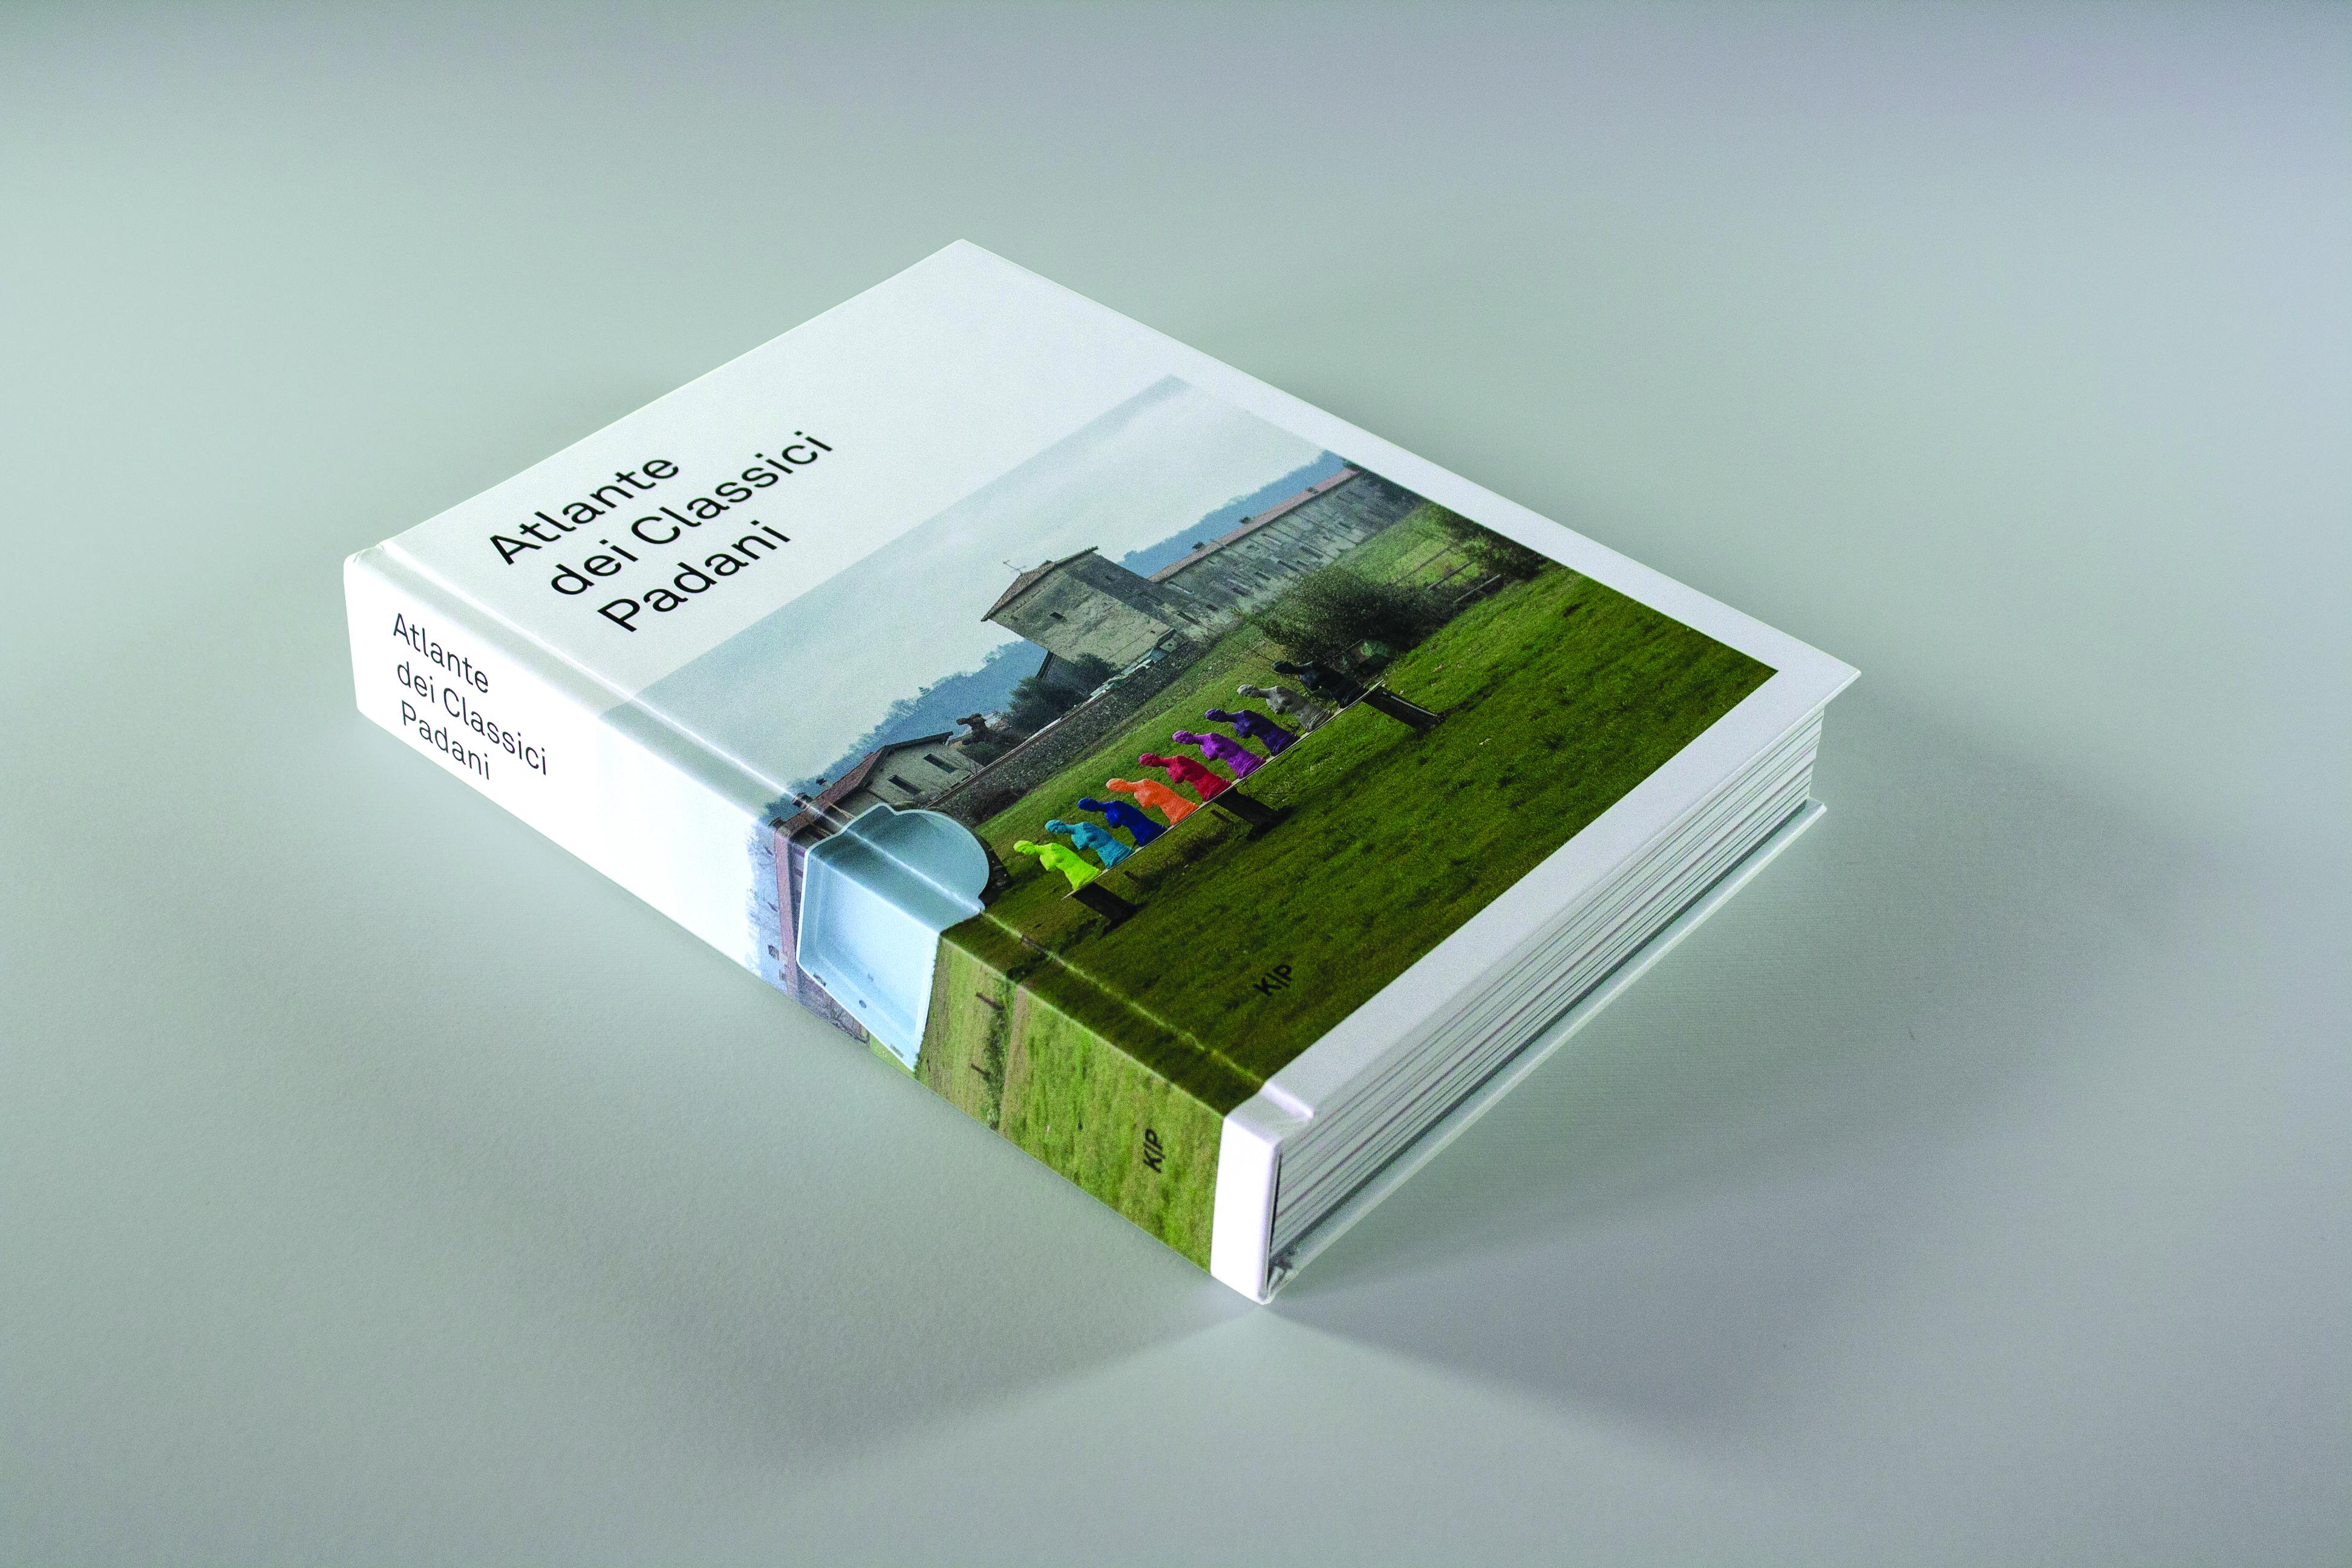 Krisis Publishing - Atlante dei Classici Padani